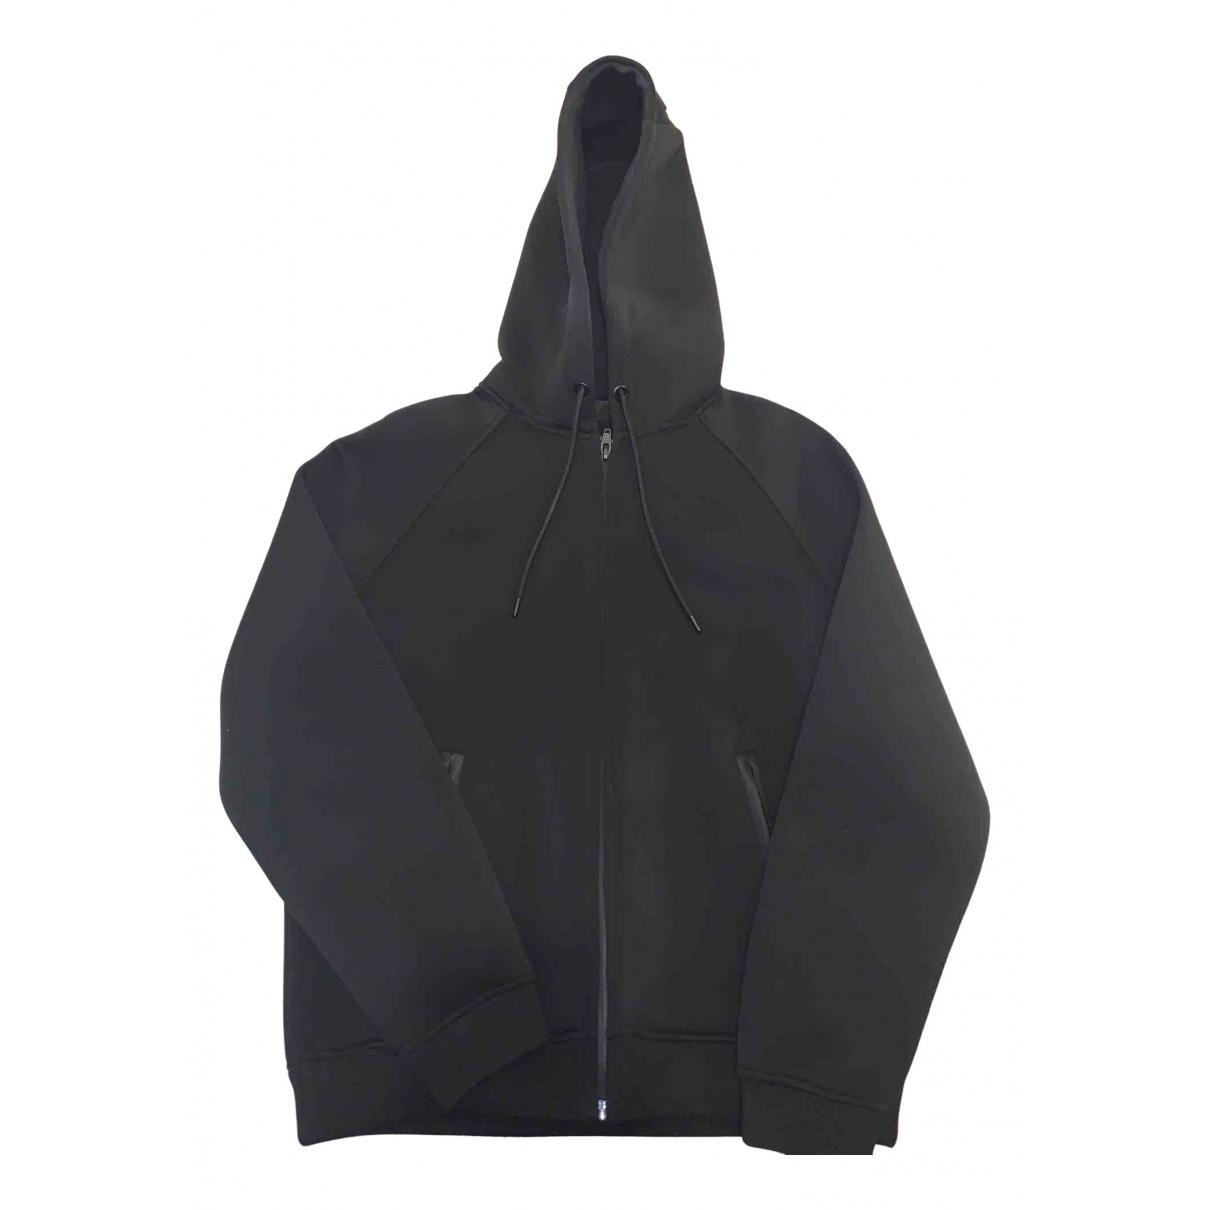 Alexander Wang Pour H&m N Black Knitwear & Sweatshirts for Men XL International